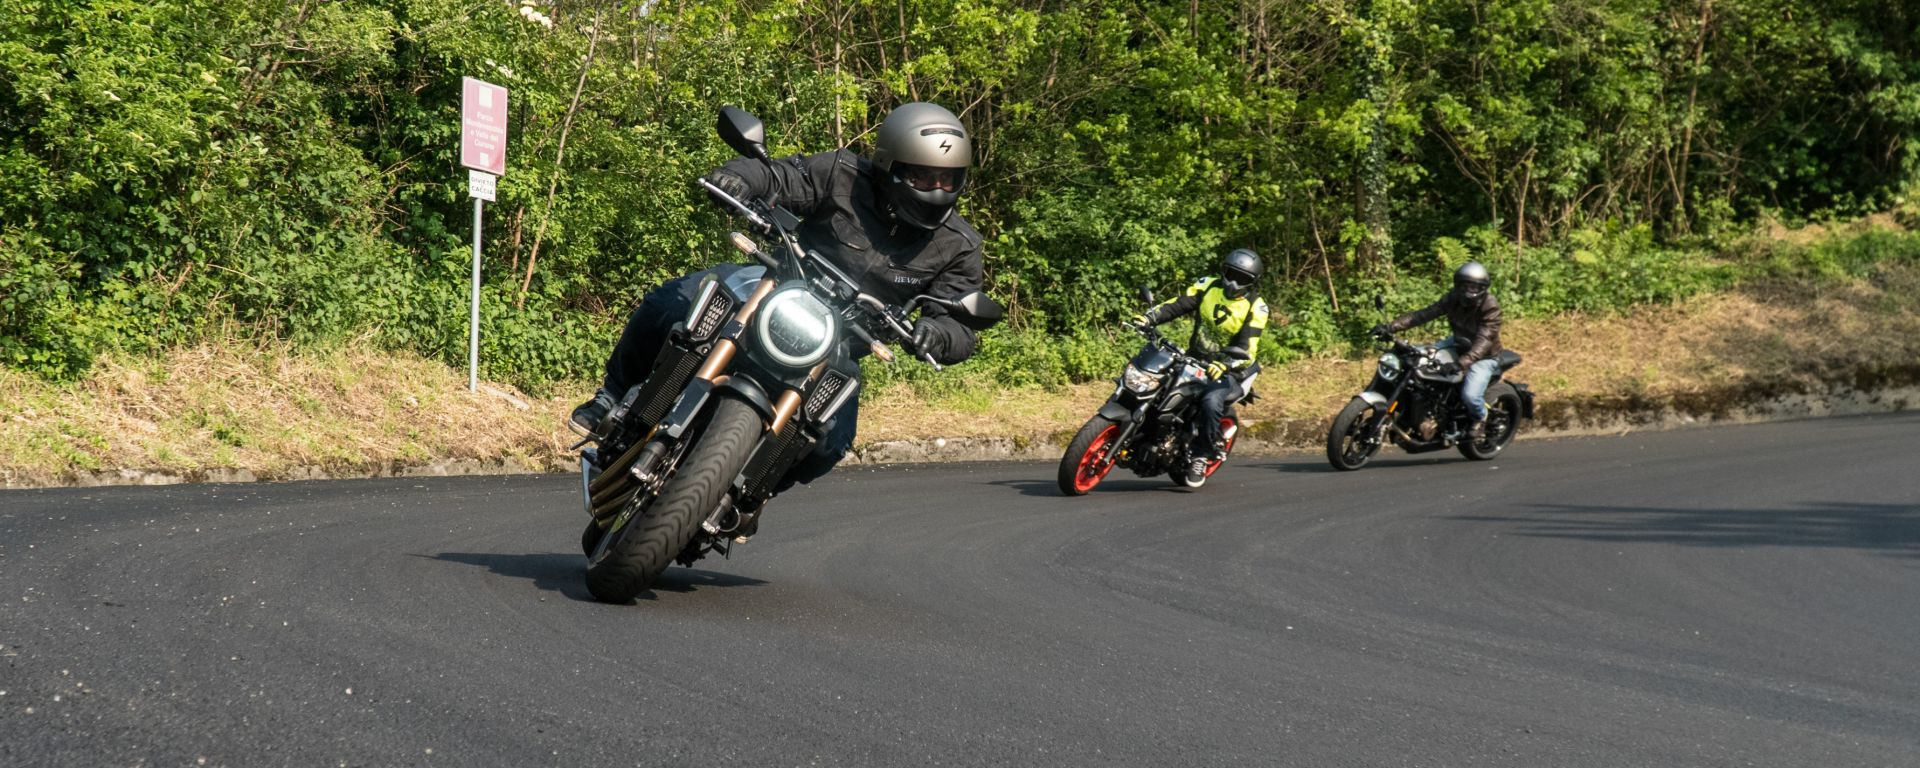 Honda CB 650 R, Yamaha MT-07, Husqvarna Vitpilen 701 a confronto